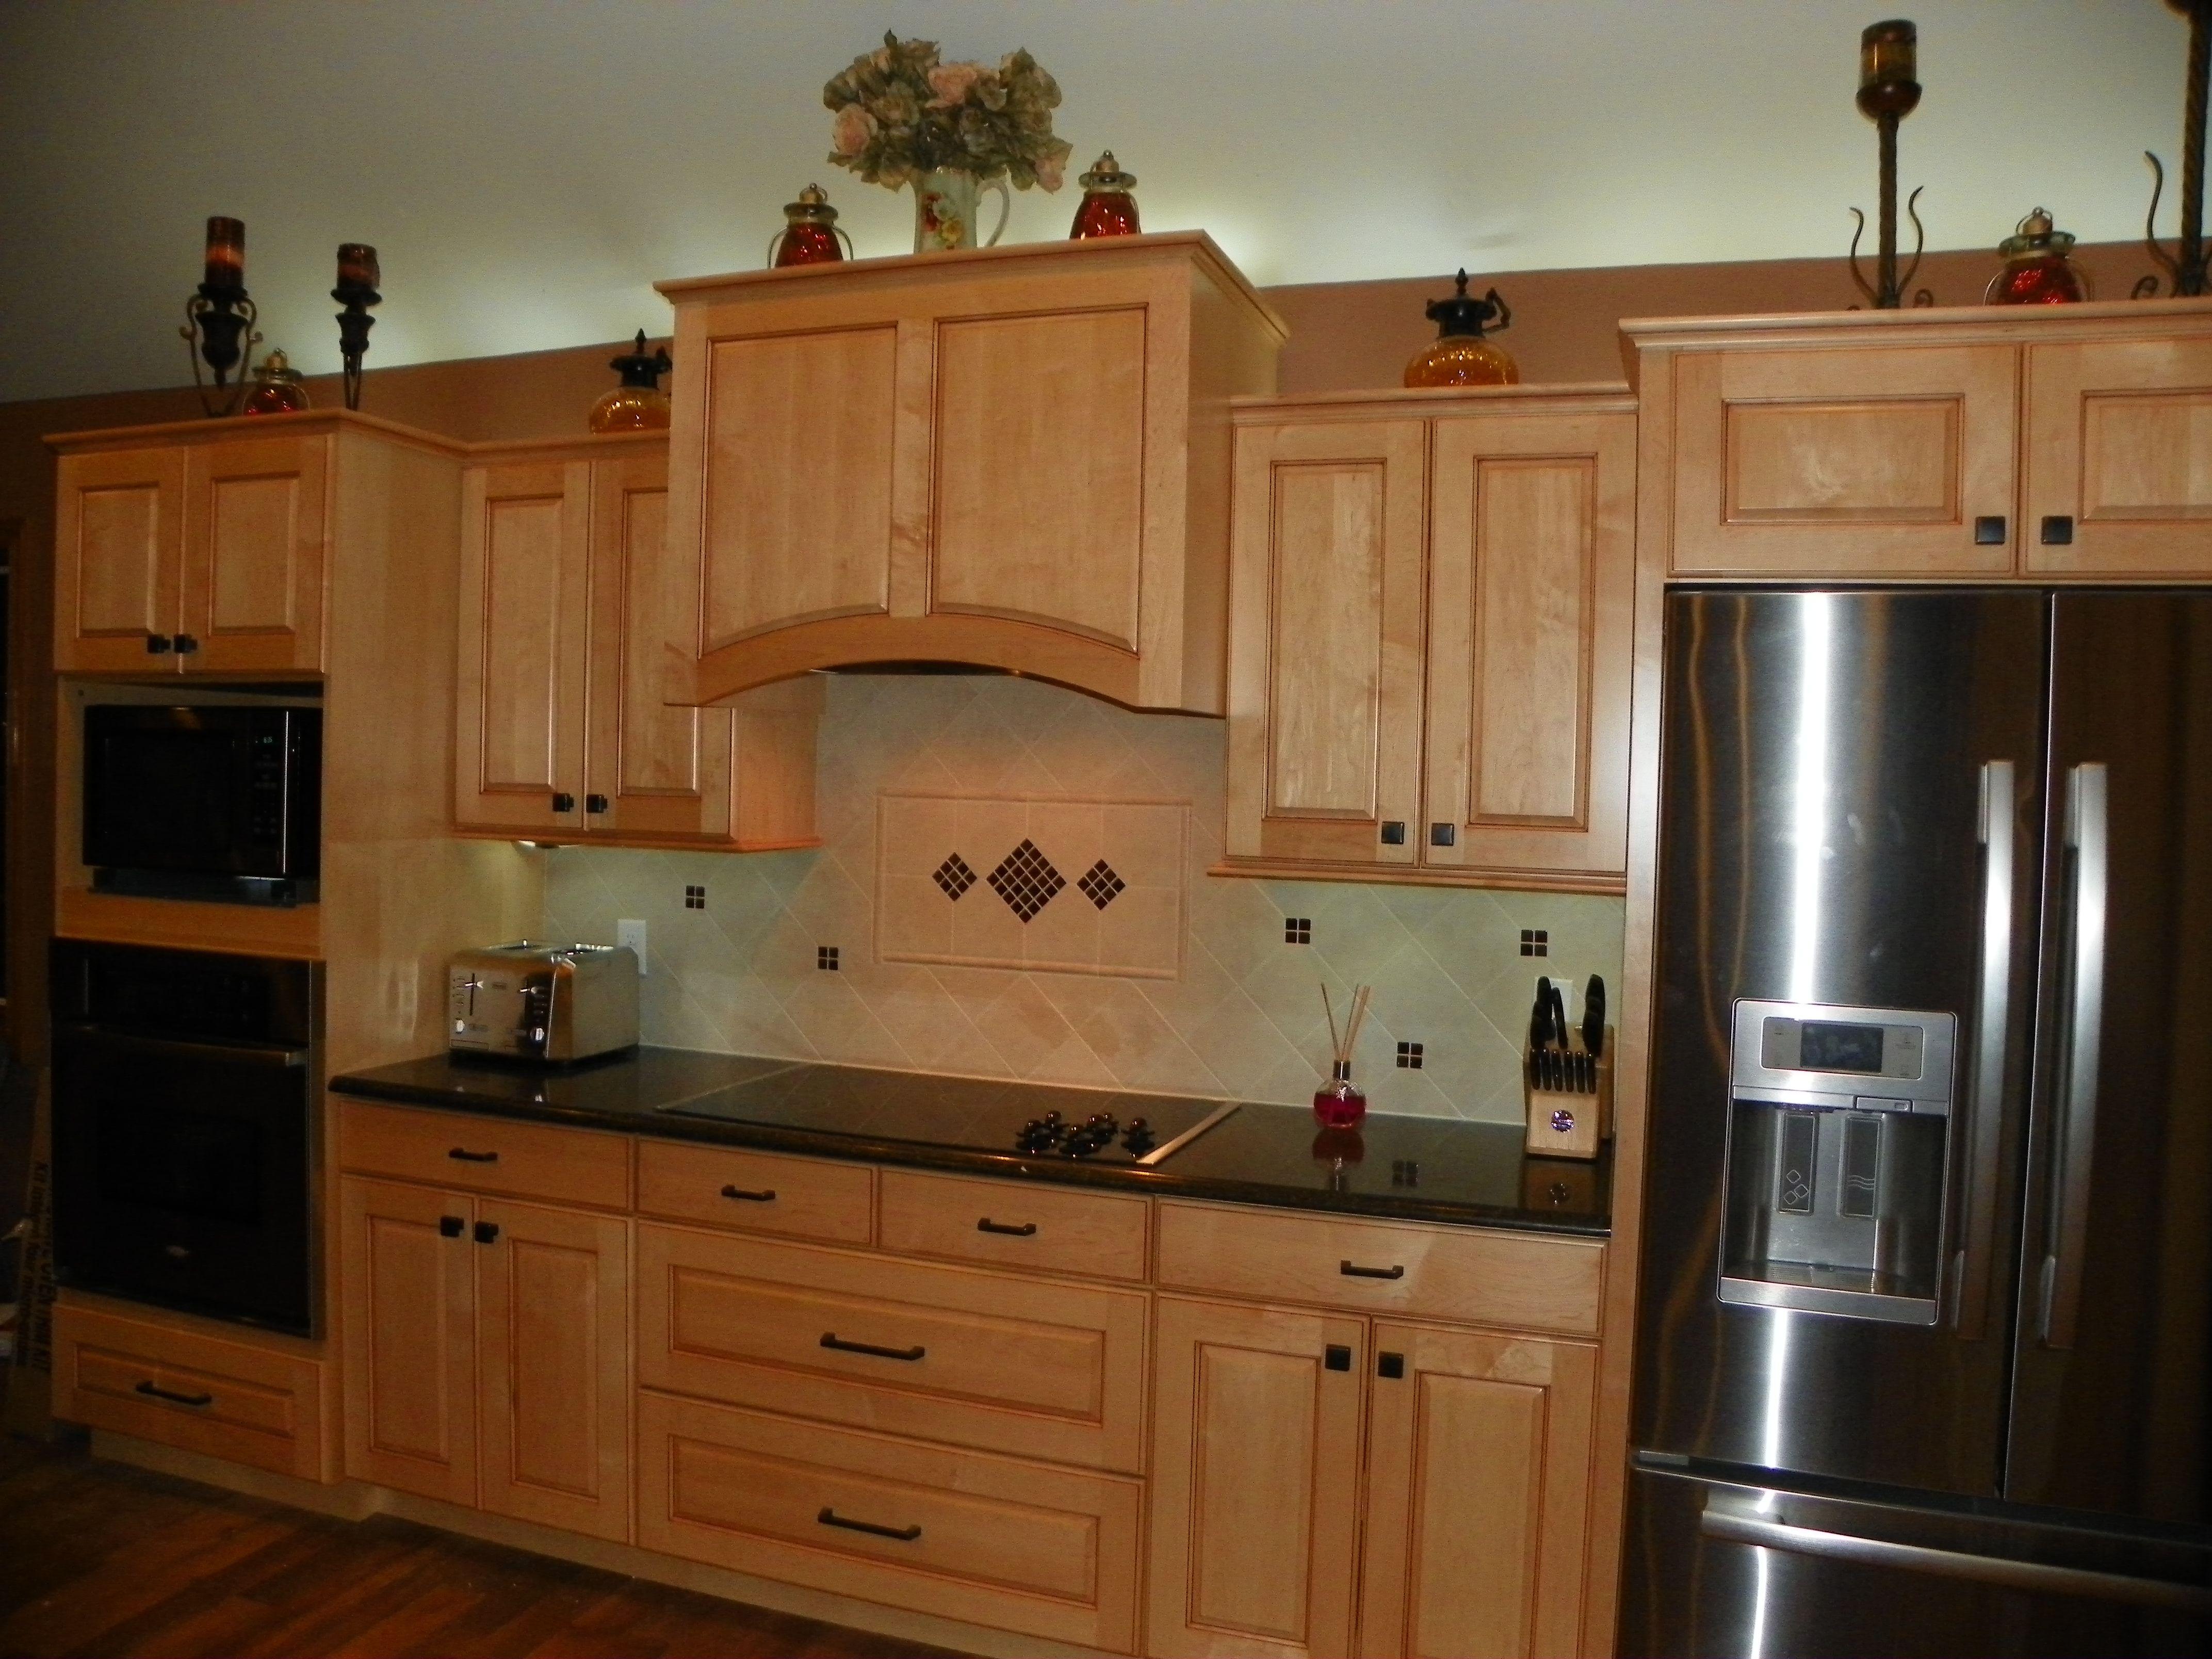 kitchen   maple cabinets   Home decor kitchen, Kitchen ...